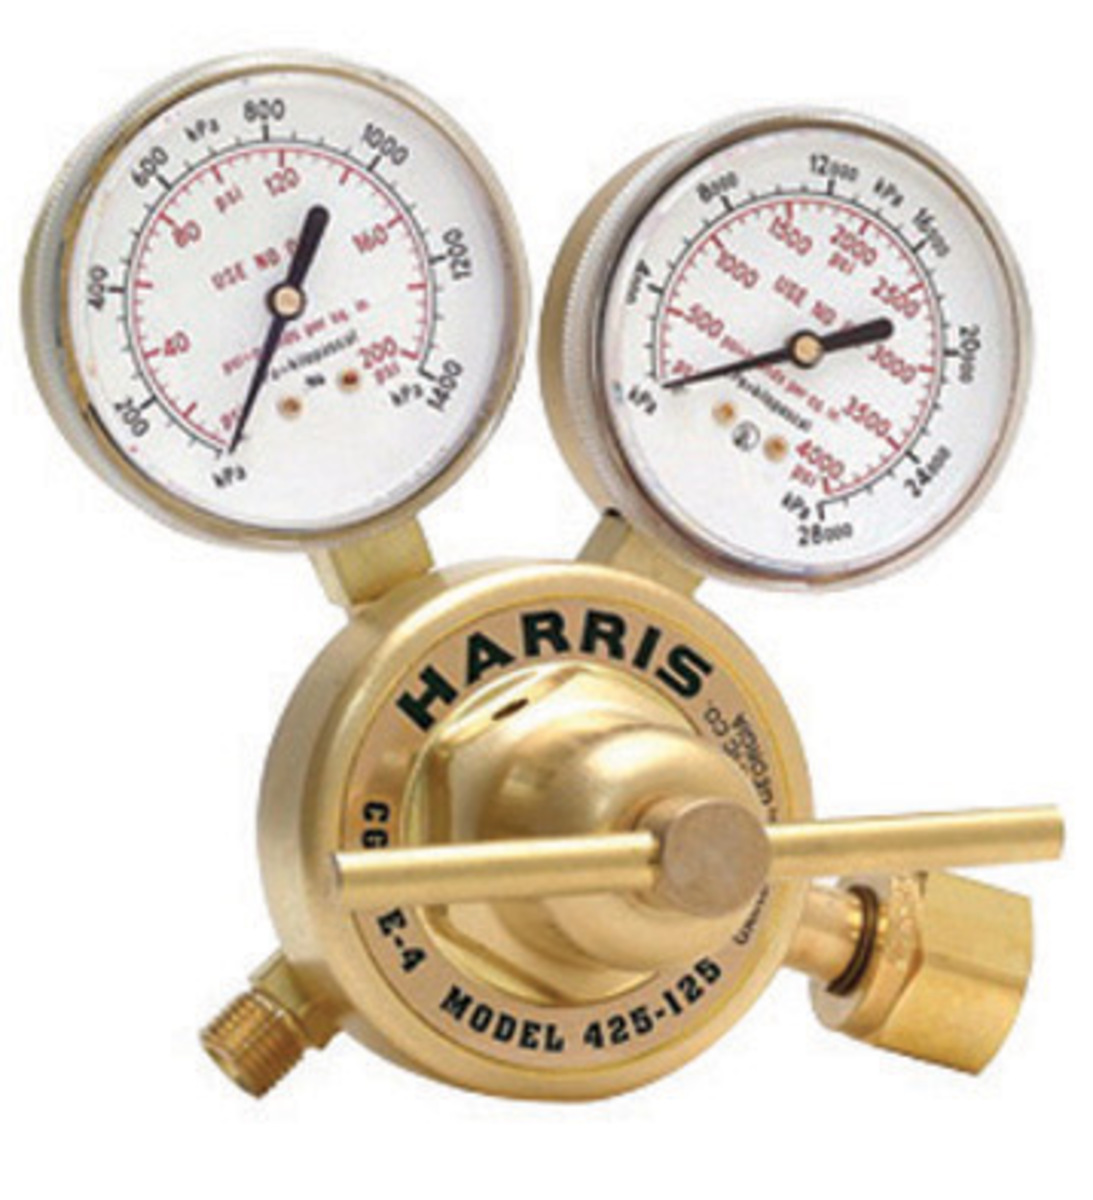 HARRIS Model 425-200 Single Stage Regulator